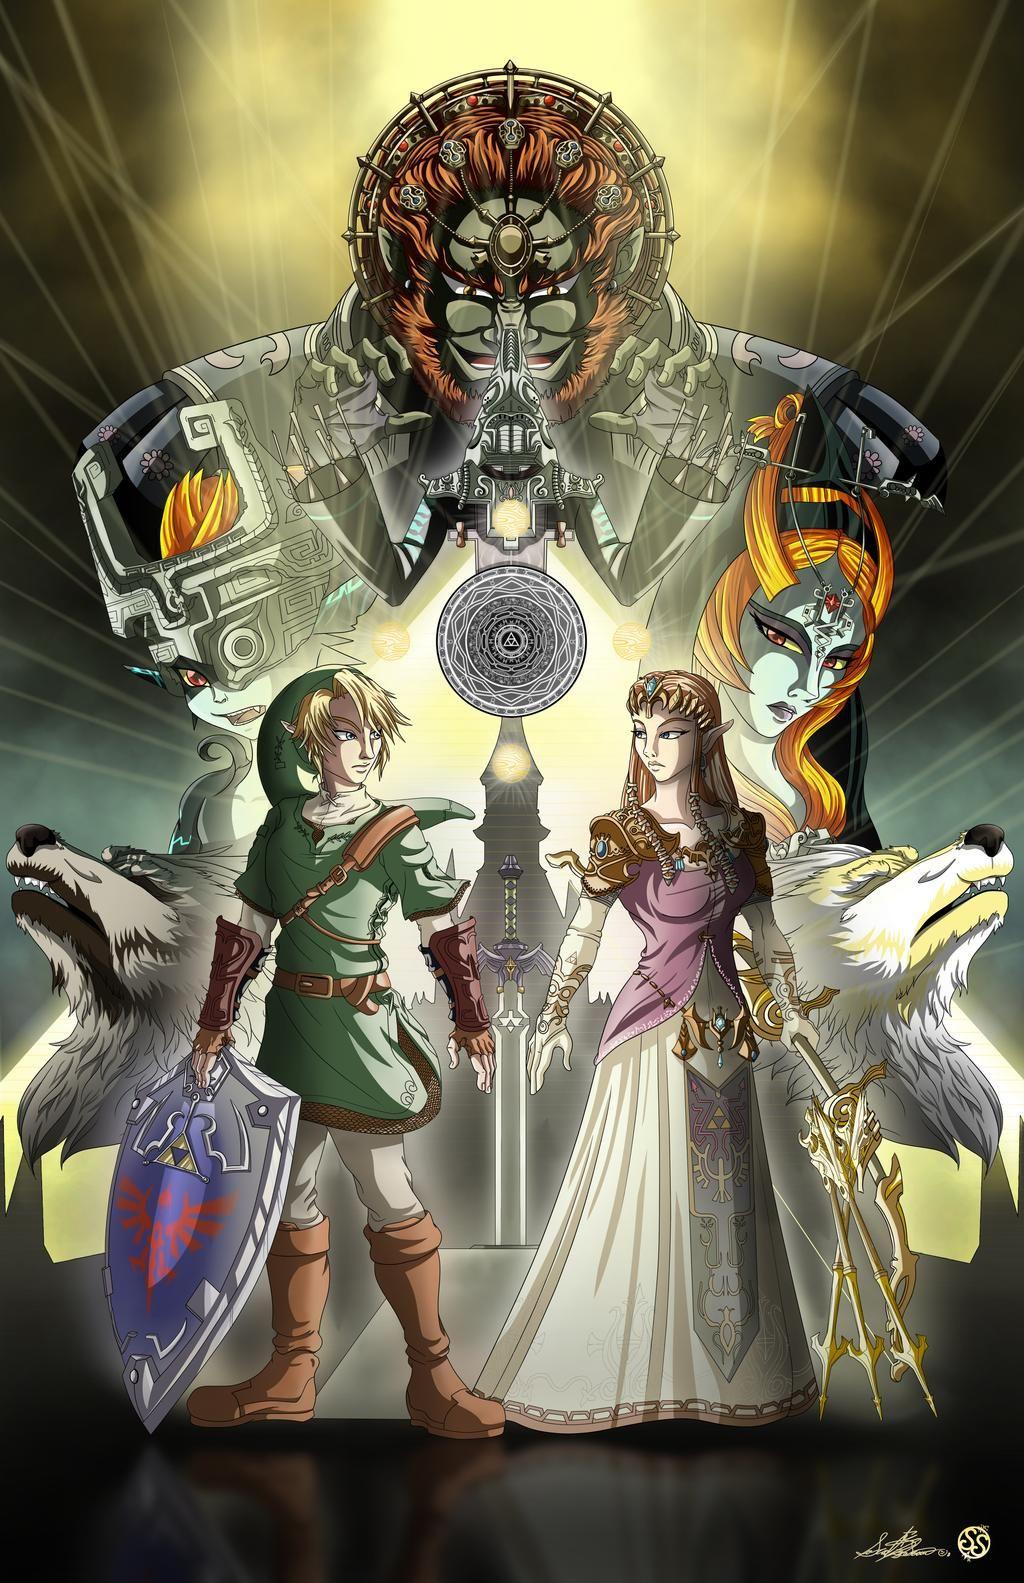 Legend Of Zelda Twilight Princess Artwork Link Princess Zelda Ganondorf Midna Zant Wolves Mir Zelda Twilight Princess Twilight Princess Legend Of Zelda